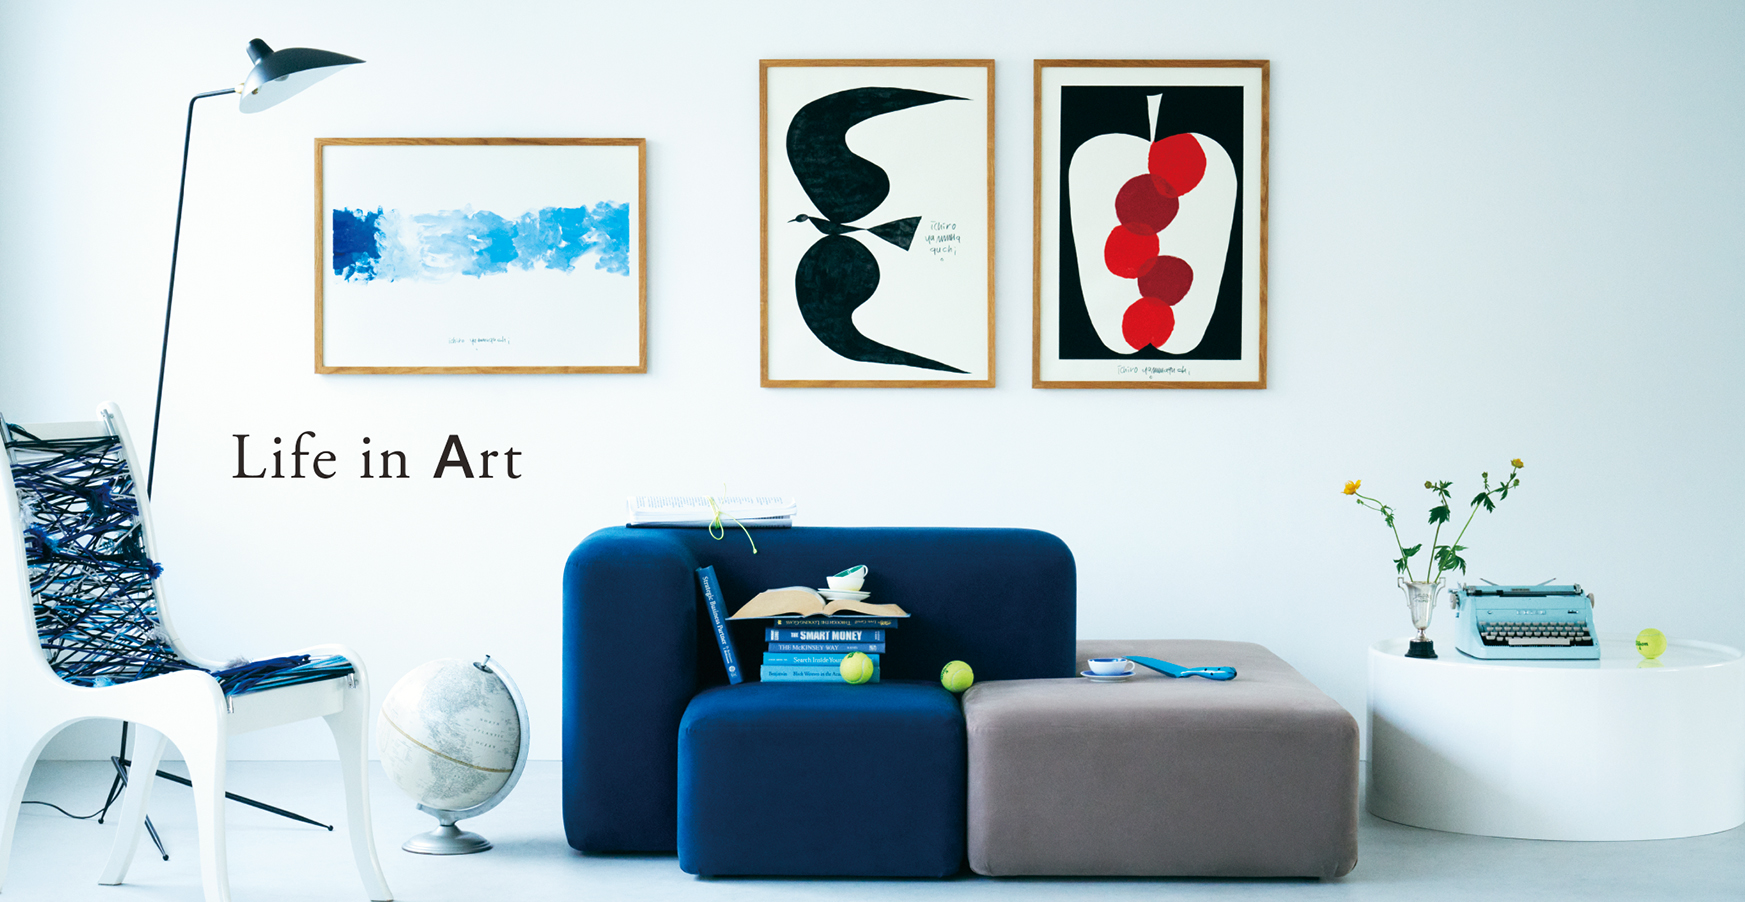 Life in Art Exhibition